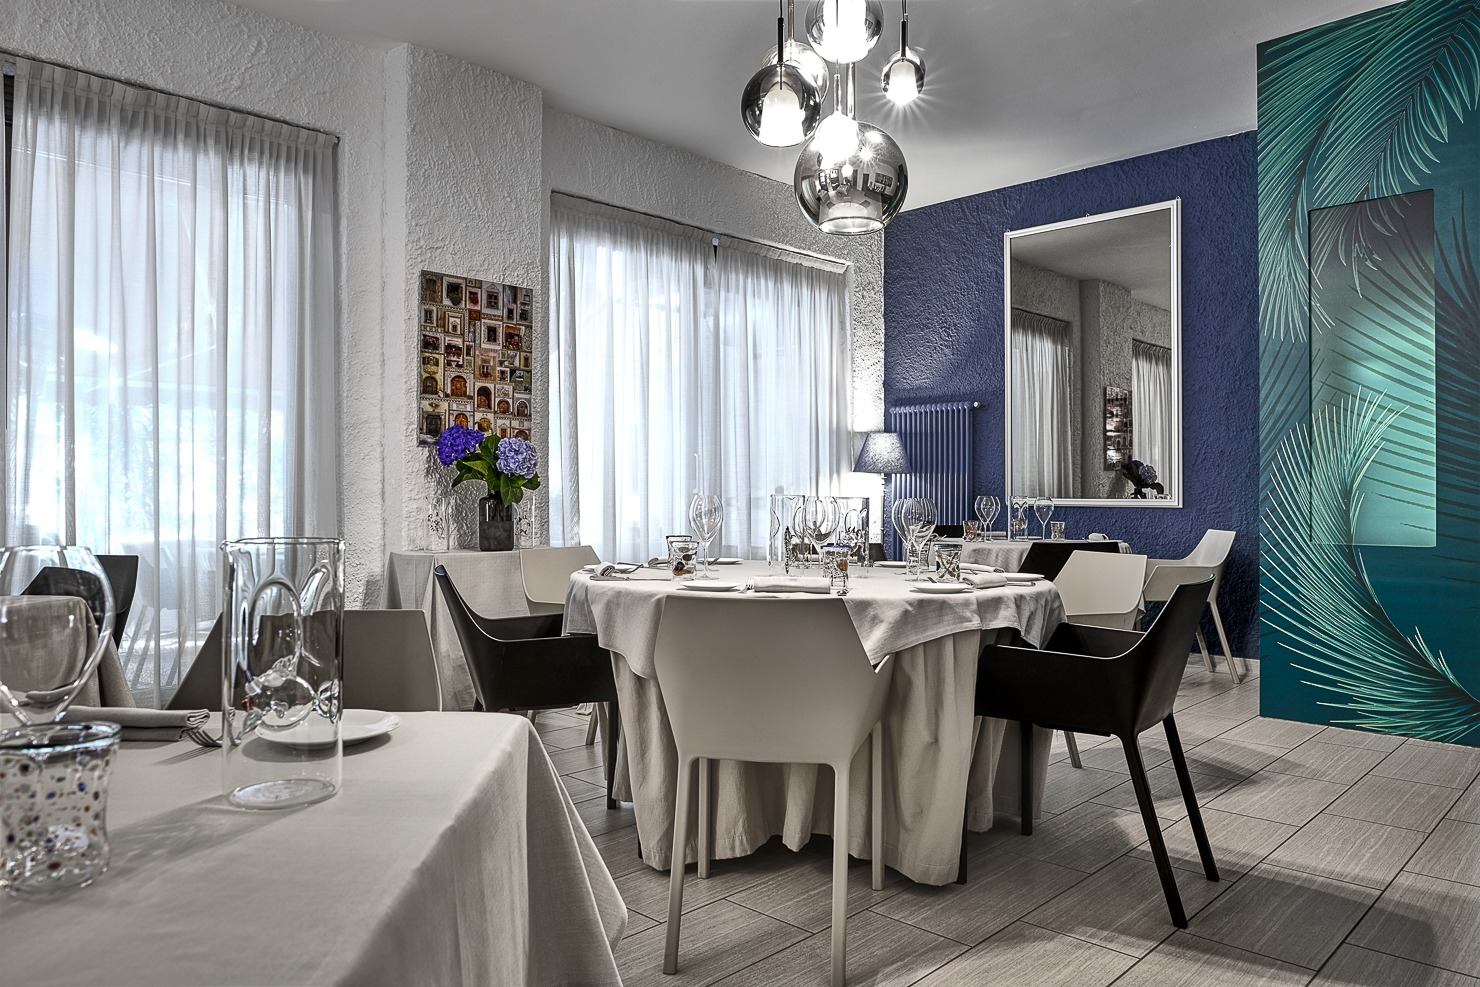 immagine-sala-ristorante2